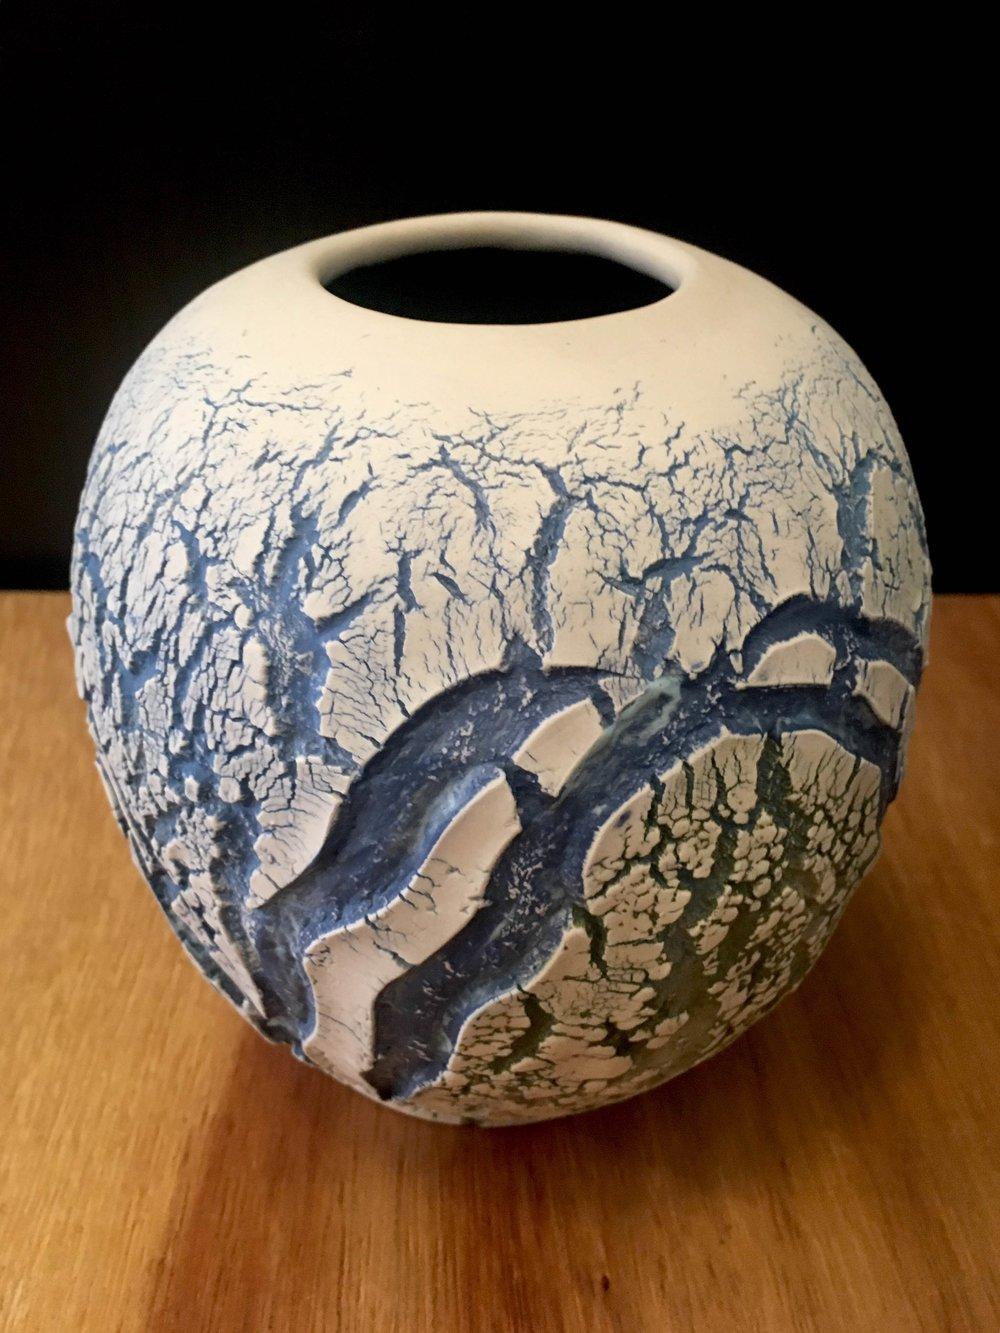 "Large waterfall vase, hand-formed porcelain, 6"" x 5"" diameter, $125"